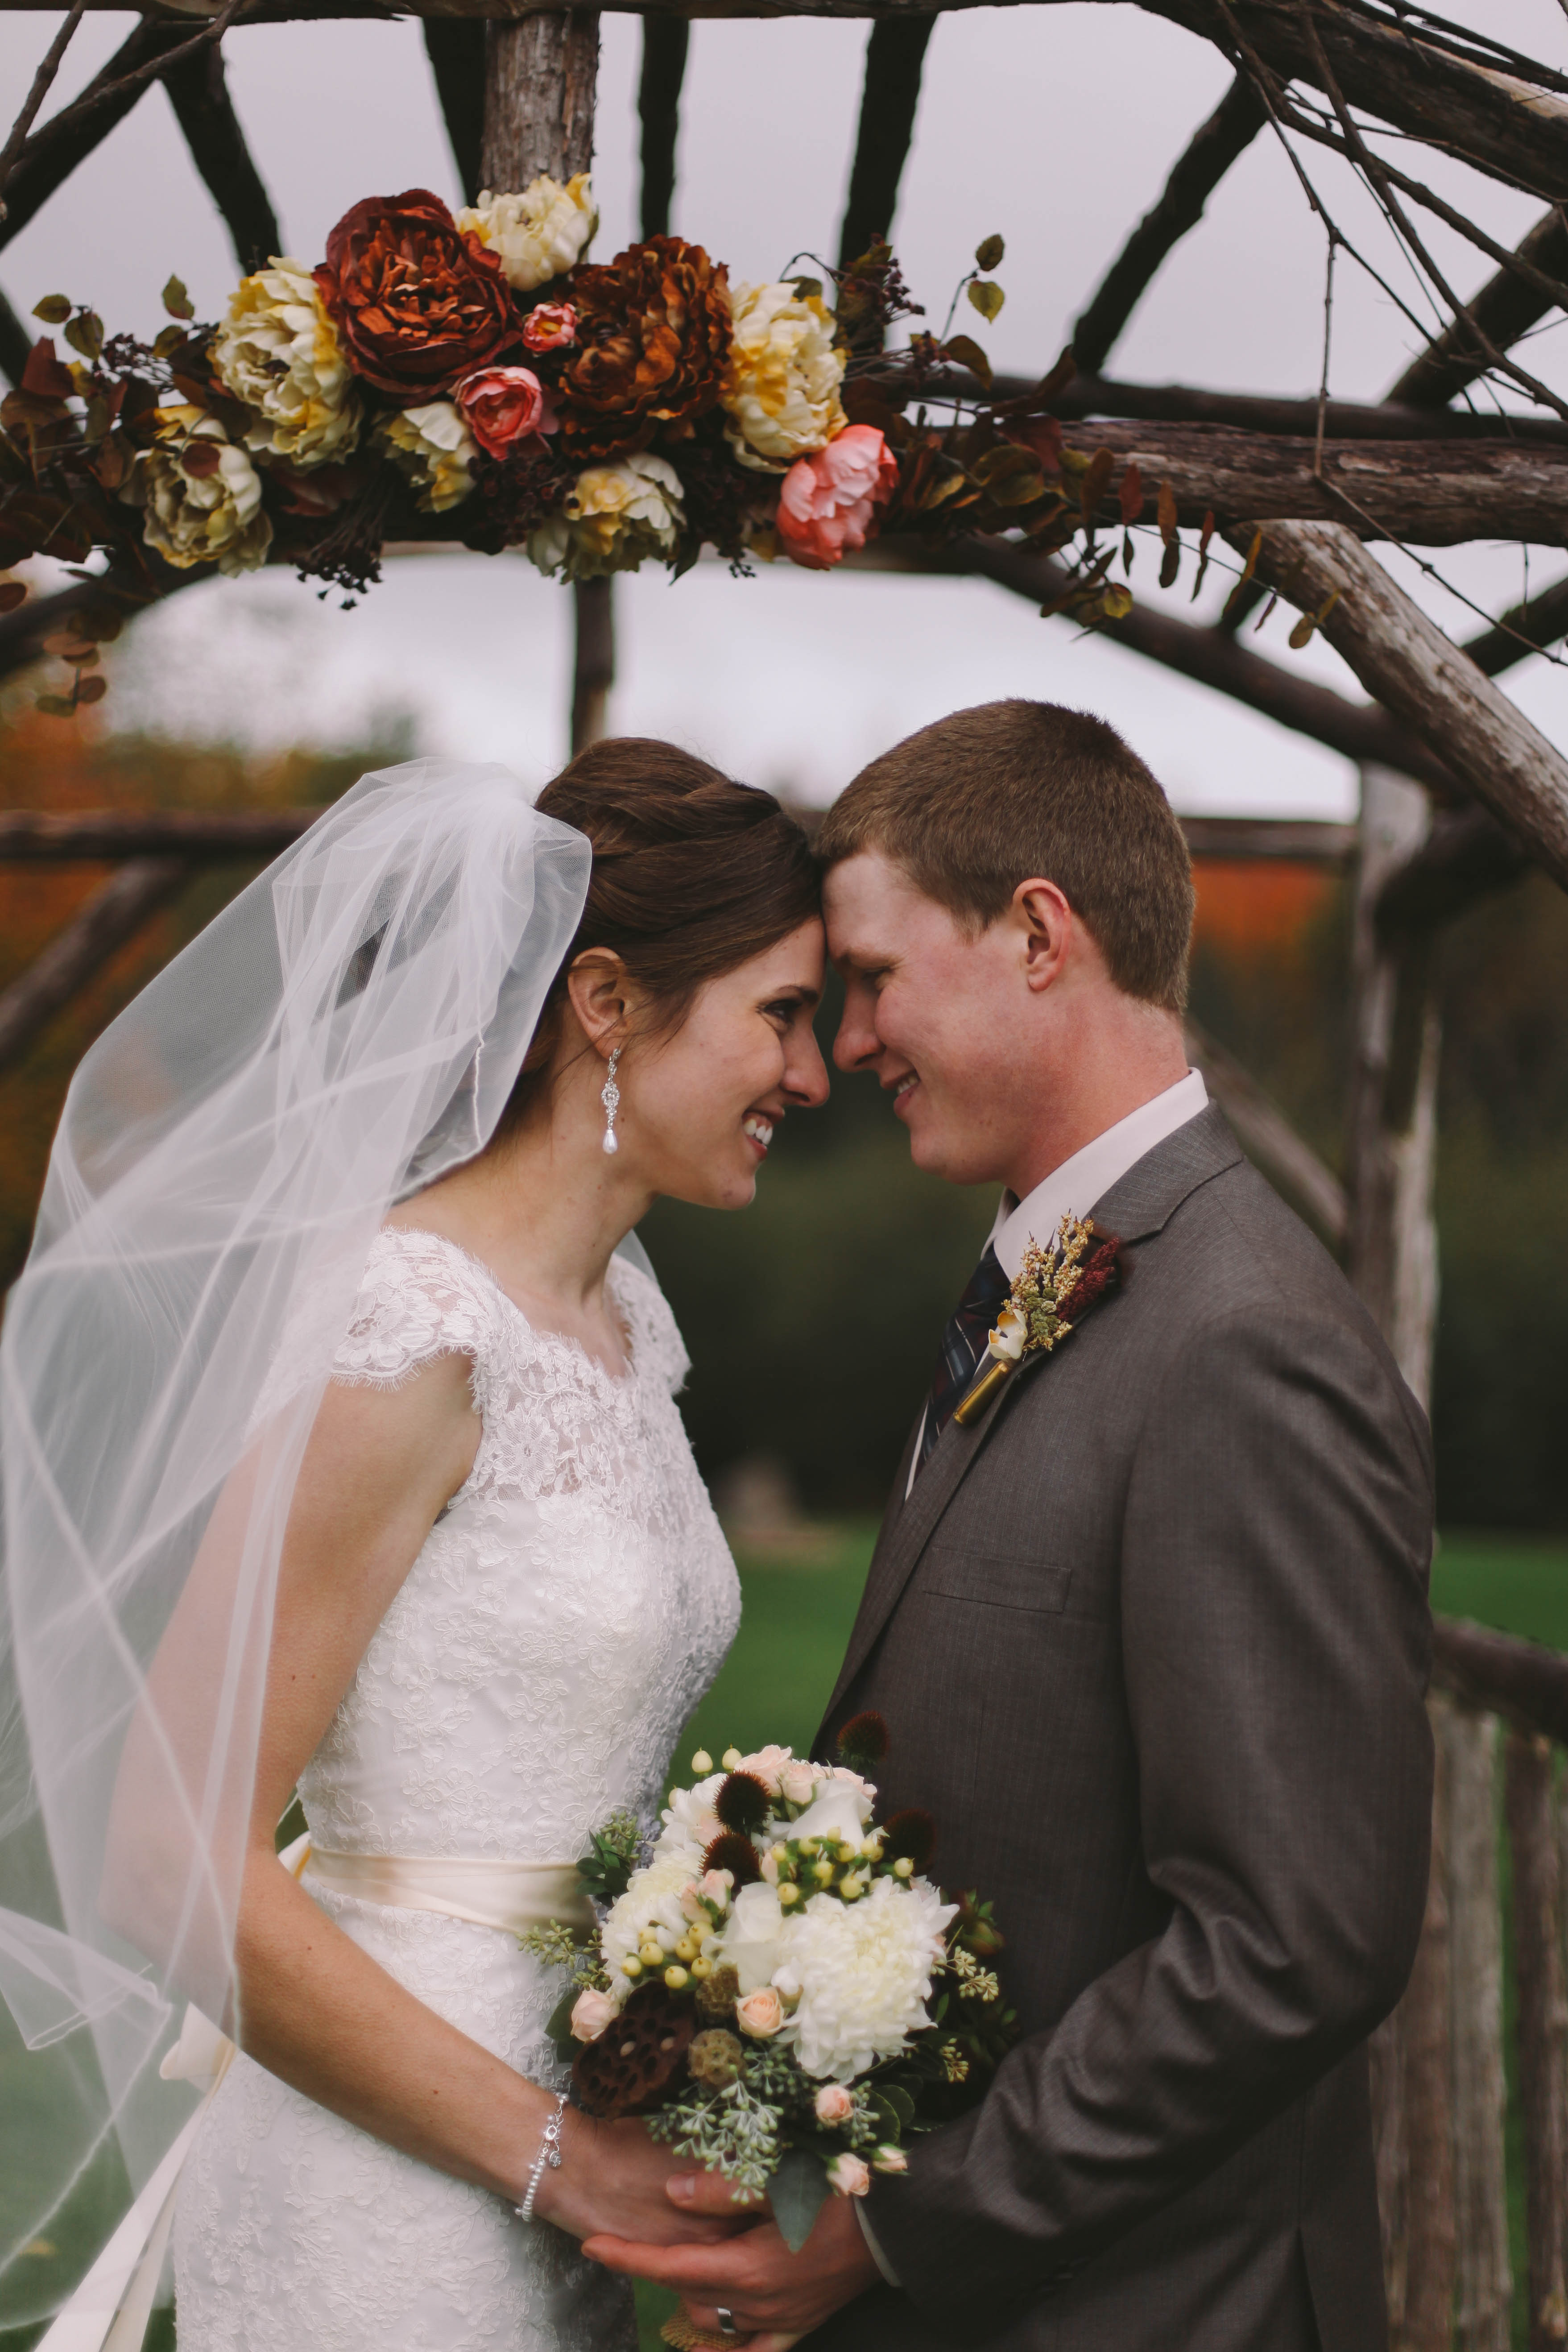 Outdoor Fall Rustic Wedding - Rustic Wedding Chic